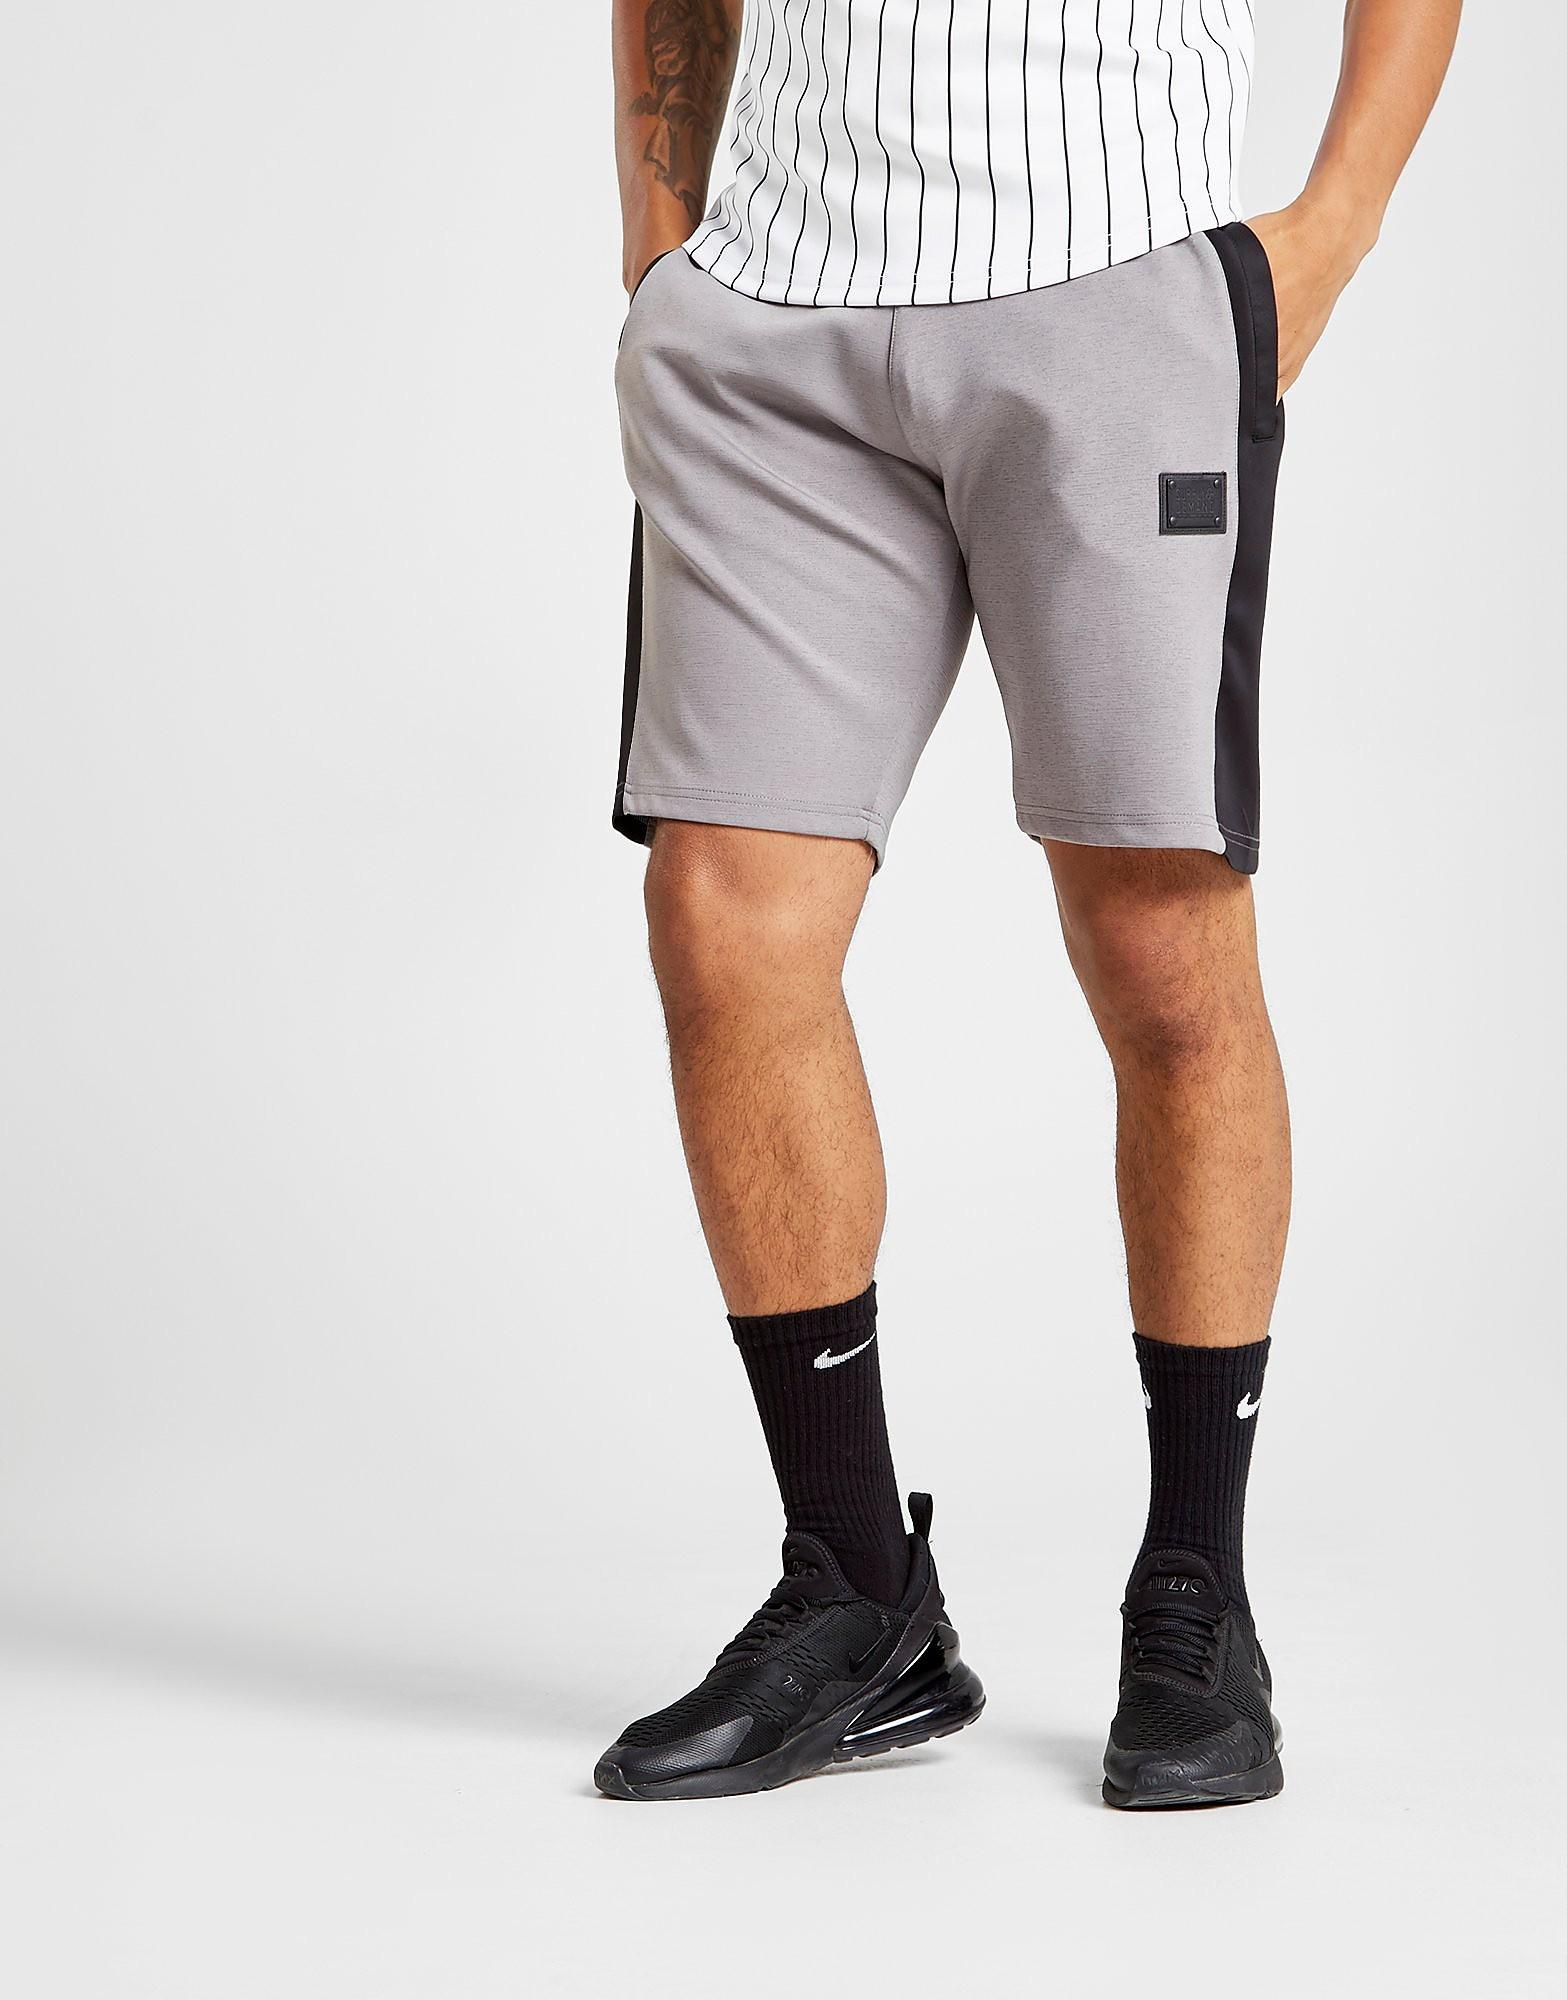 Supply & Demand Slide Shorts